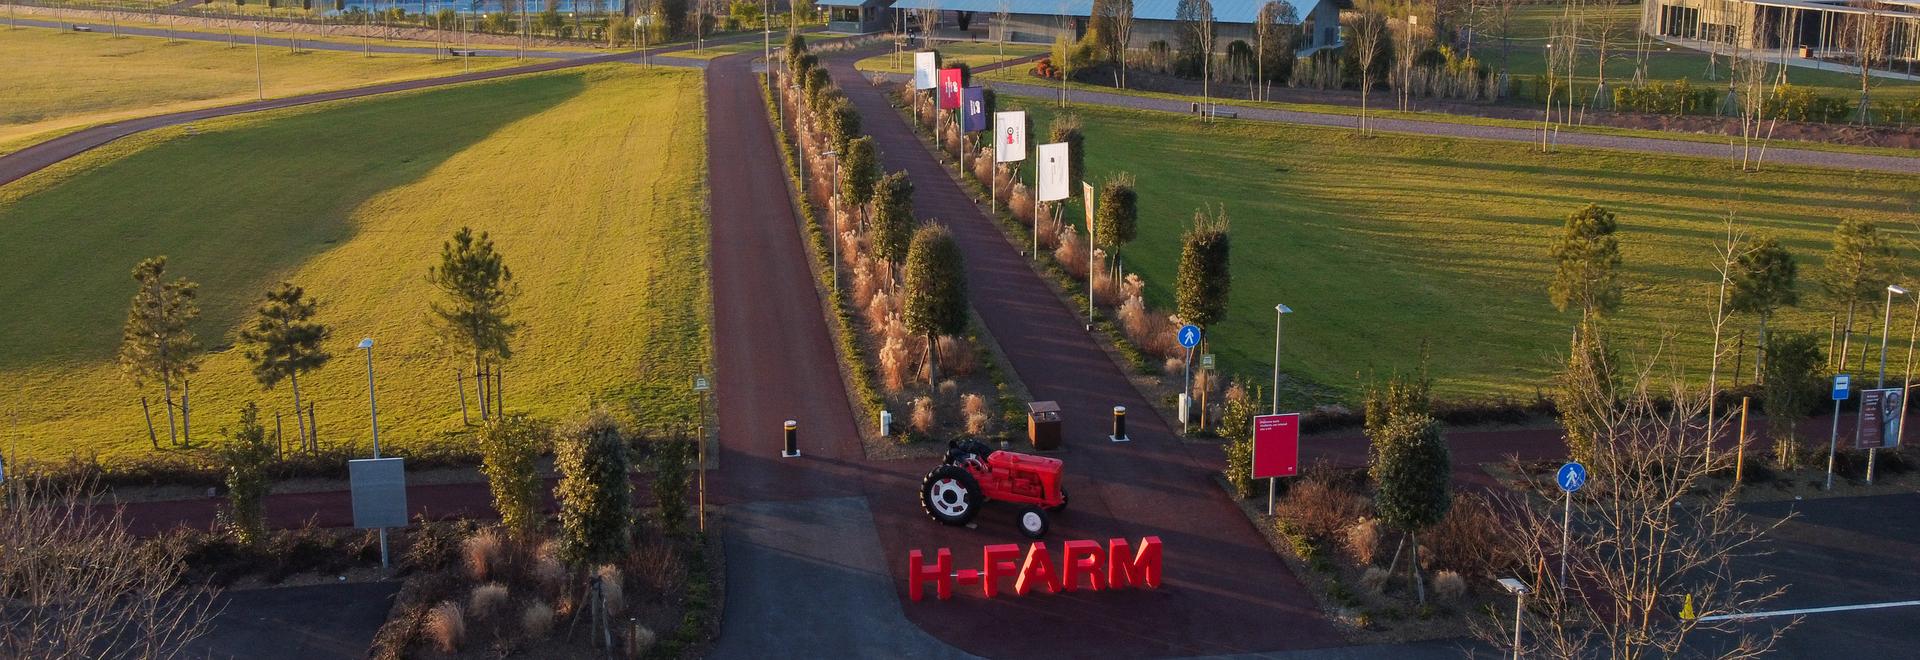 H-Farm - Tenuta Ca' Tron